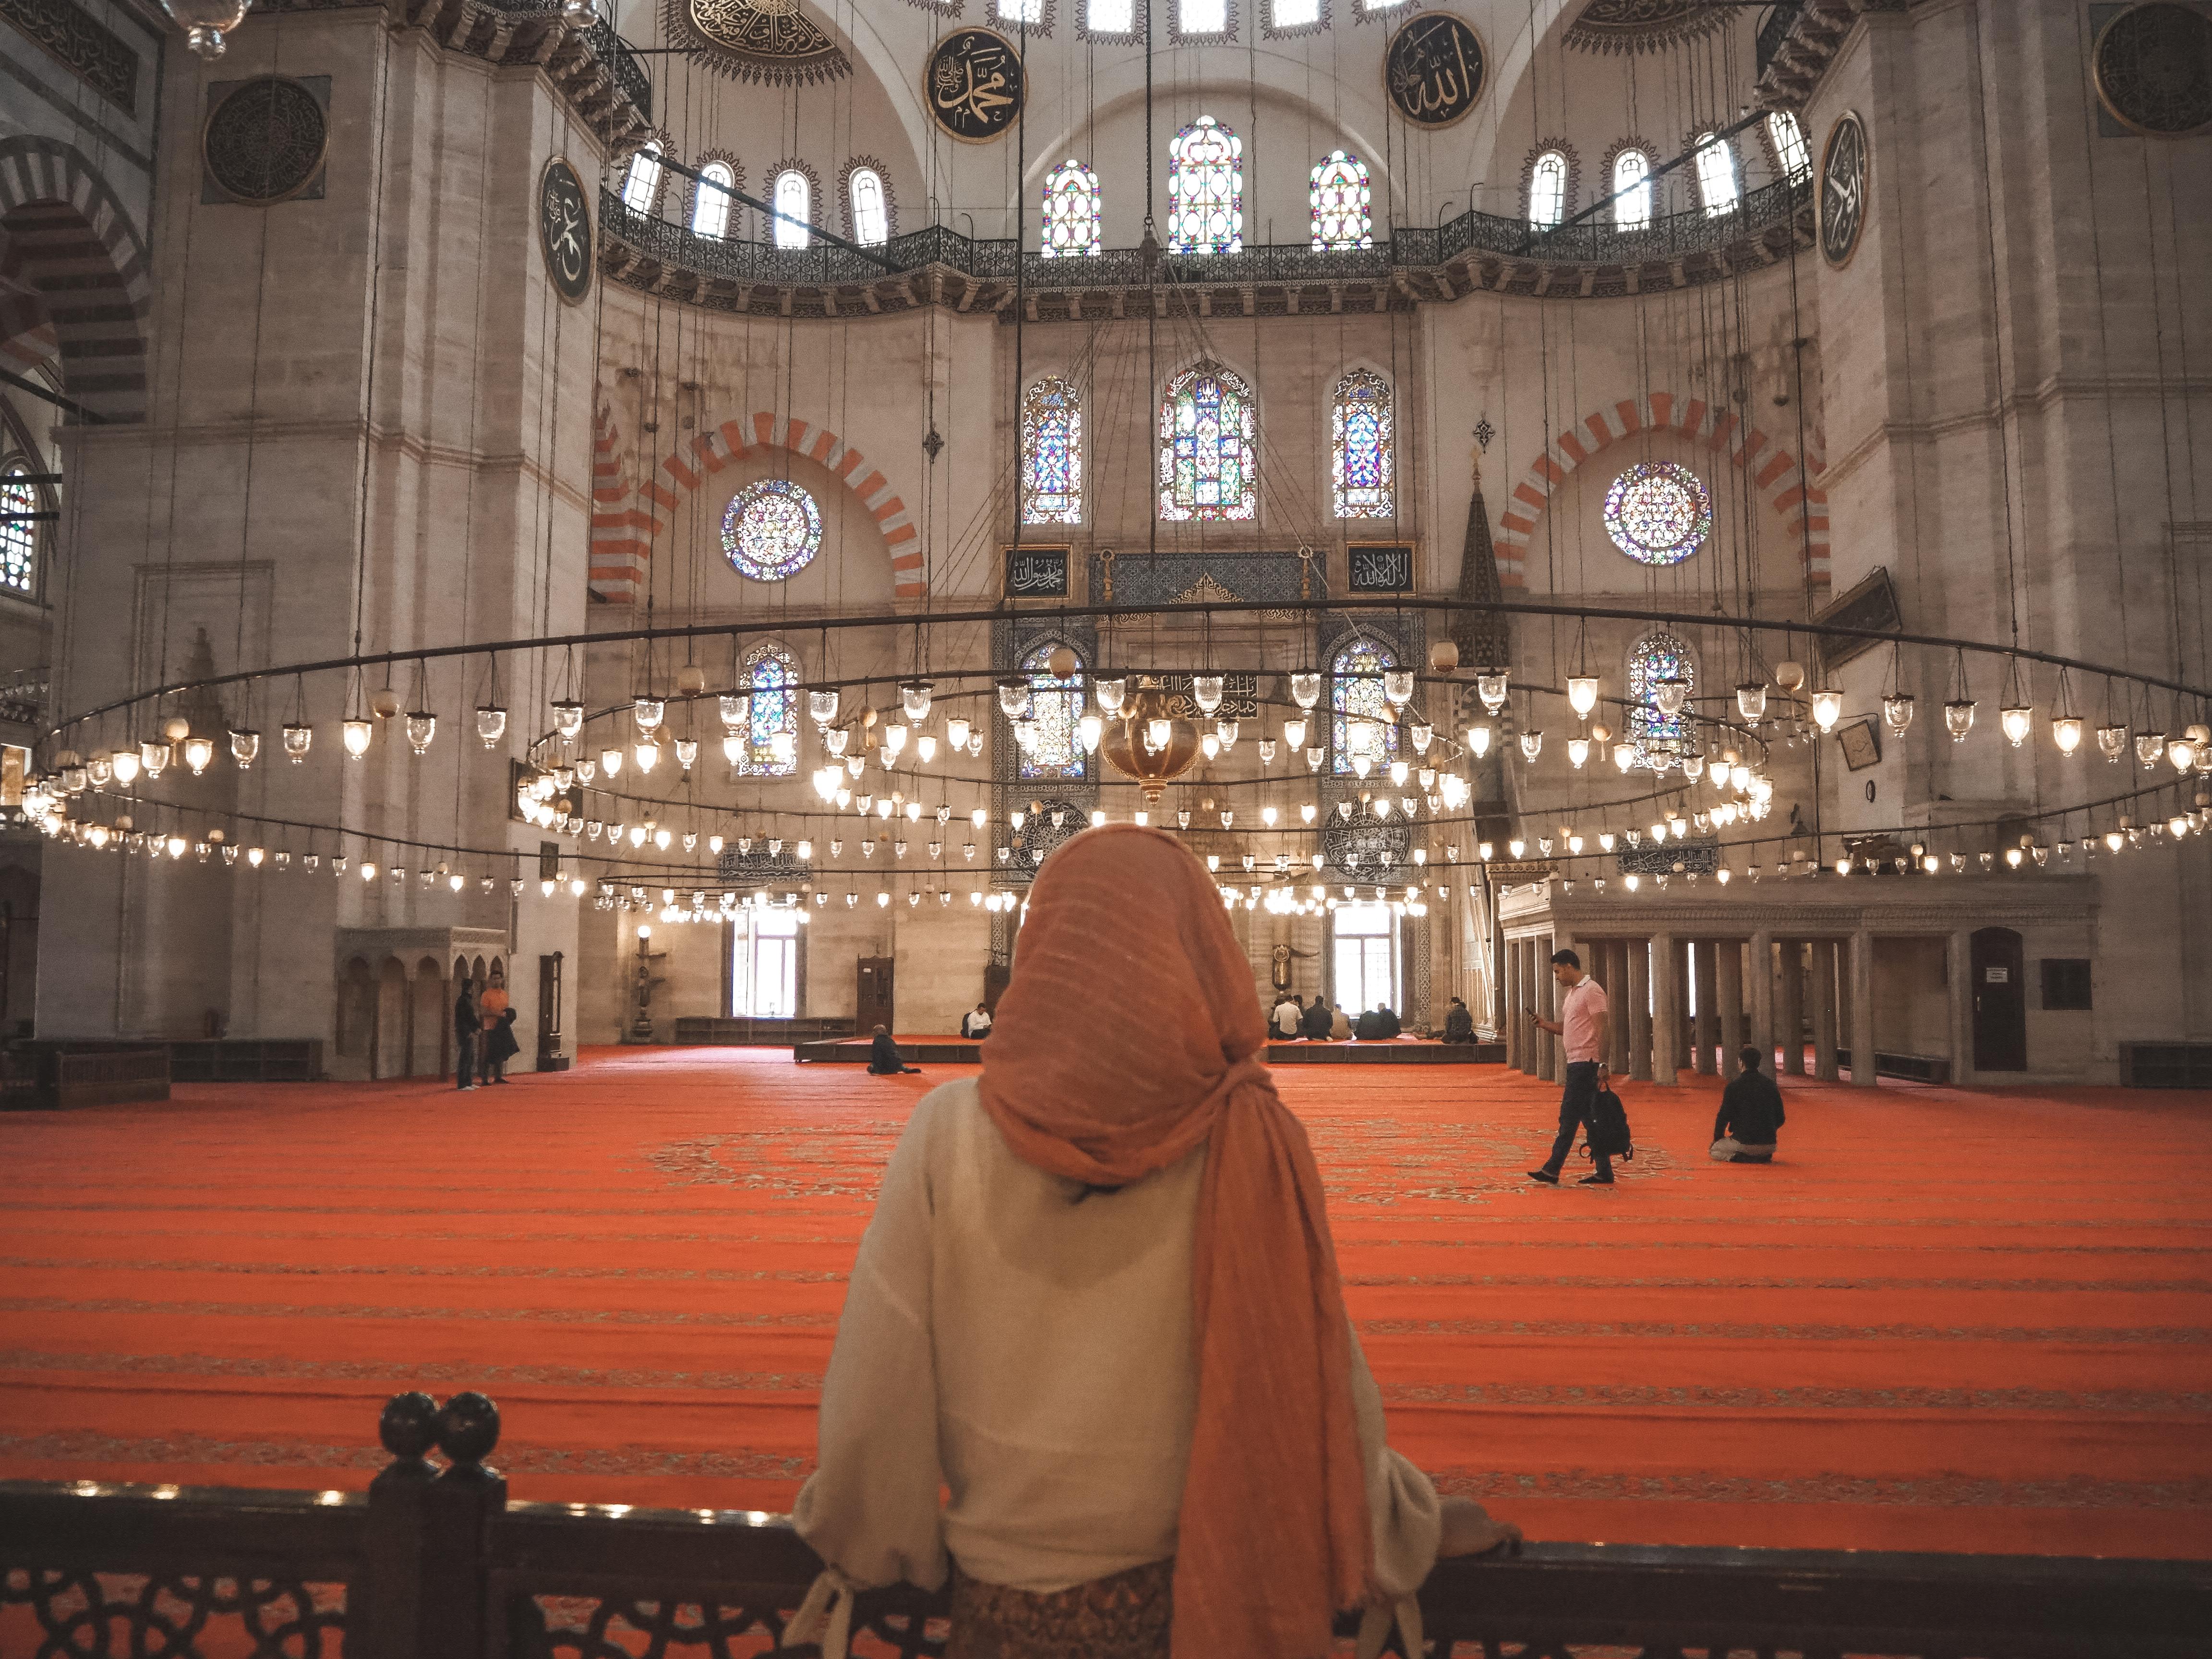 Mezquita Suleyman